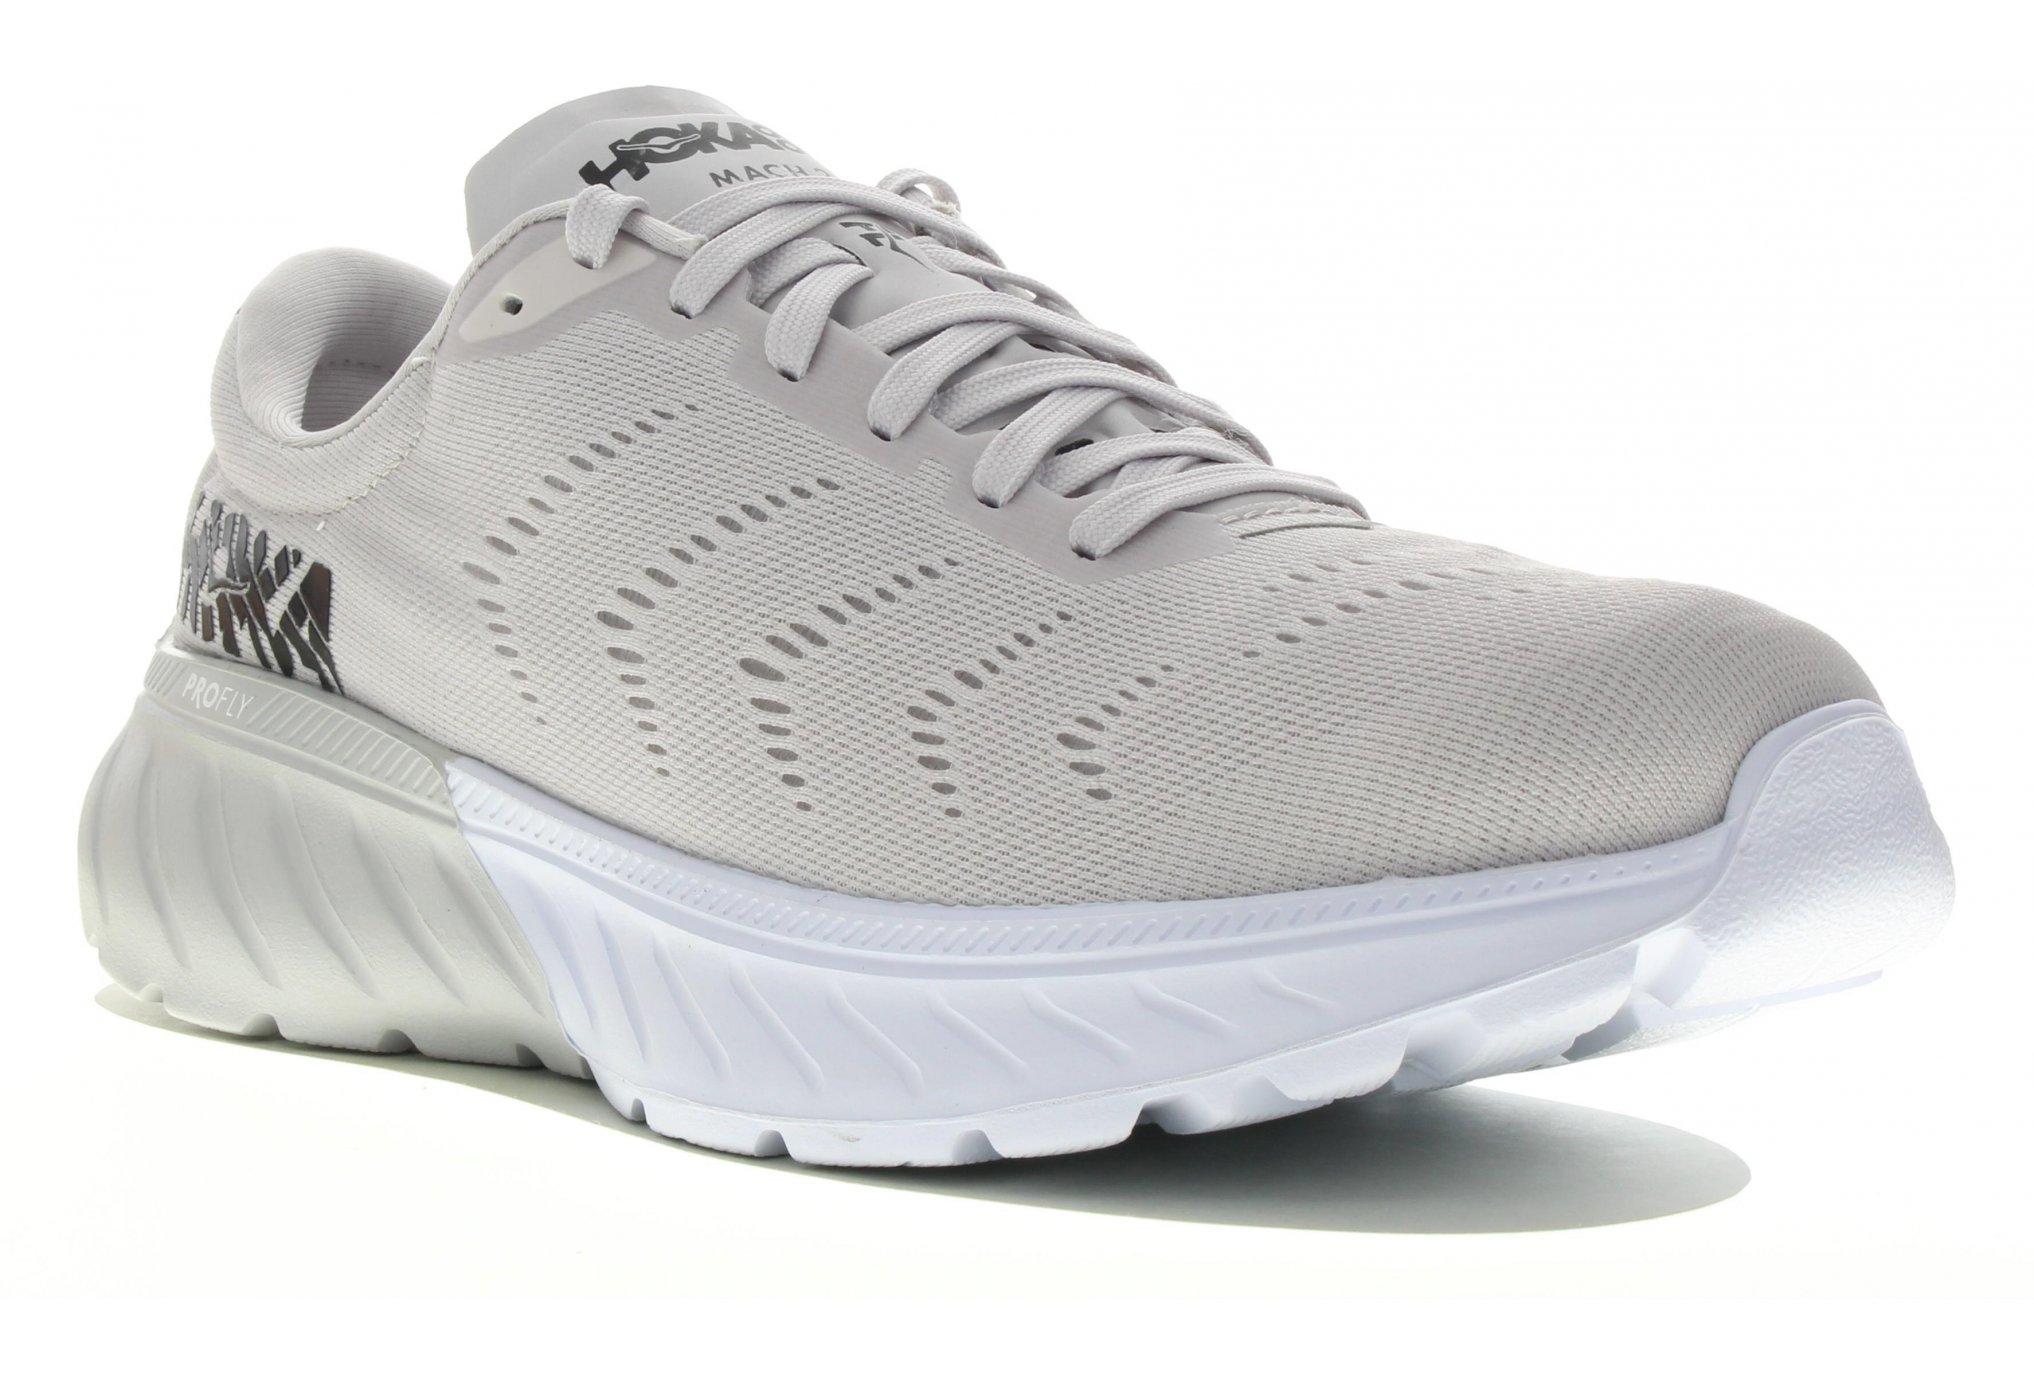 Hoka One One Mach 2 M Diététique Chaussures homme